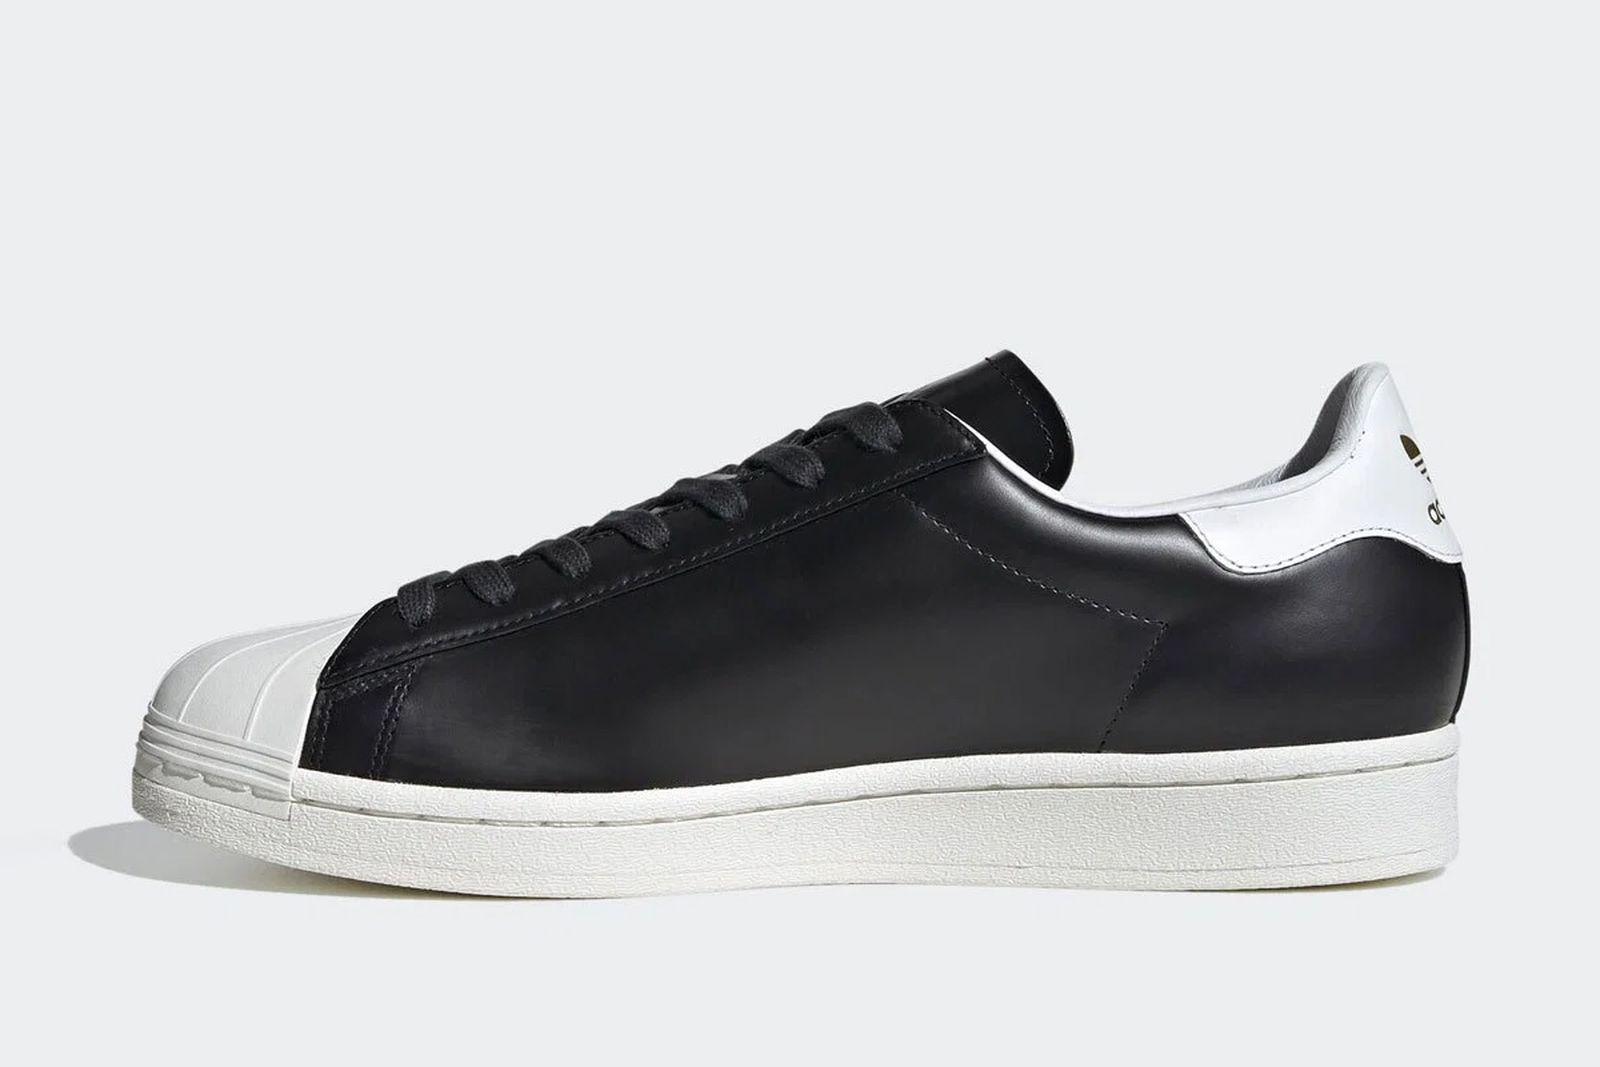 adidas-superstar-pure-paris-release-date-price-02